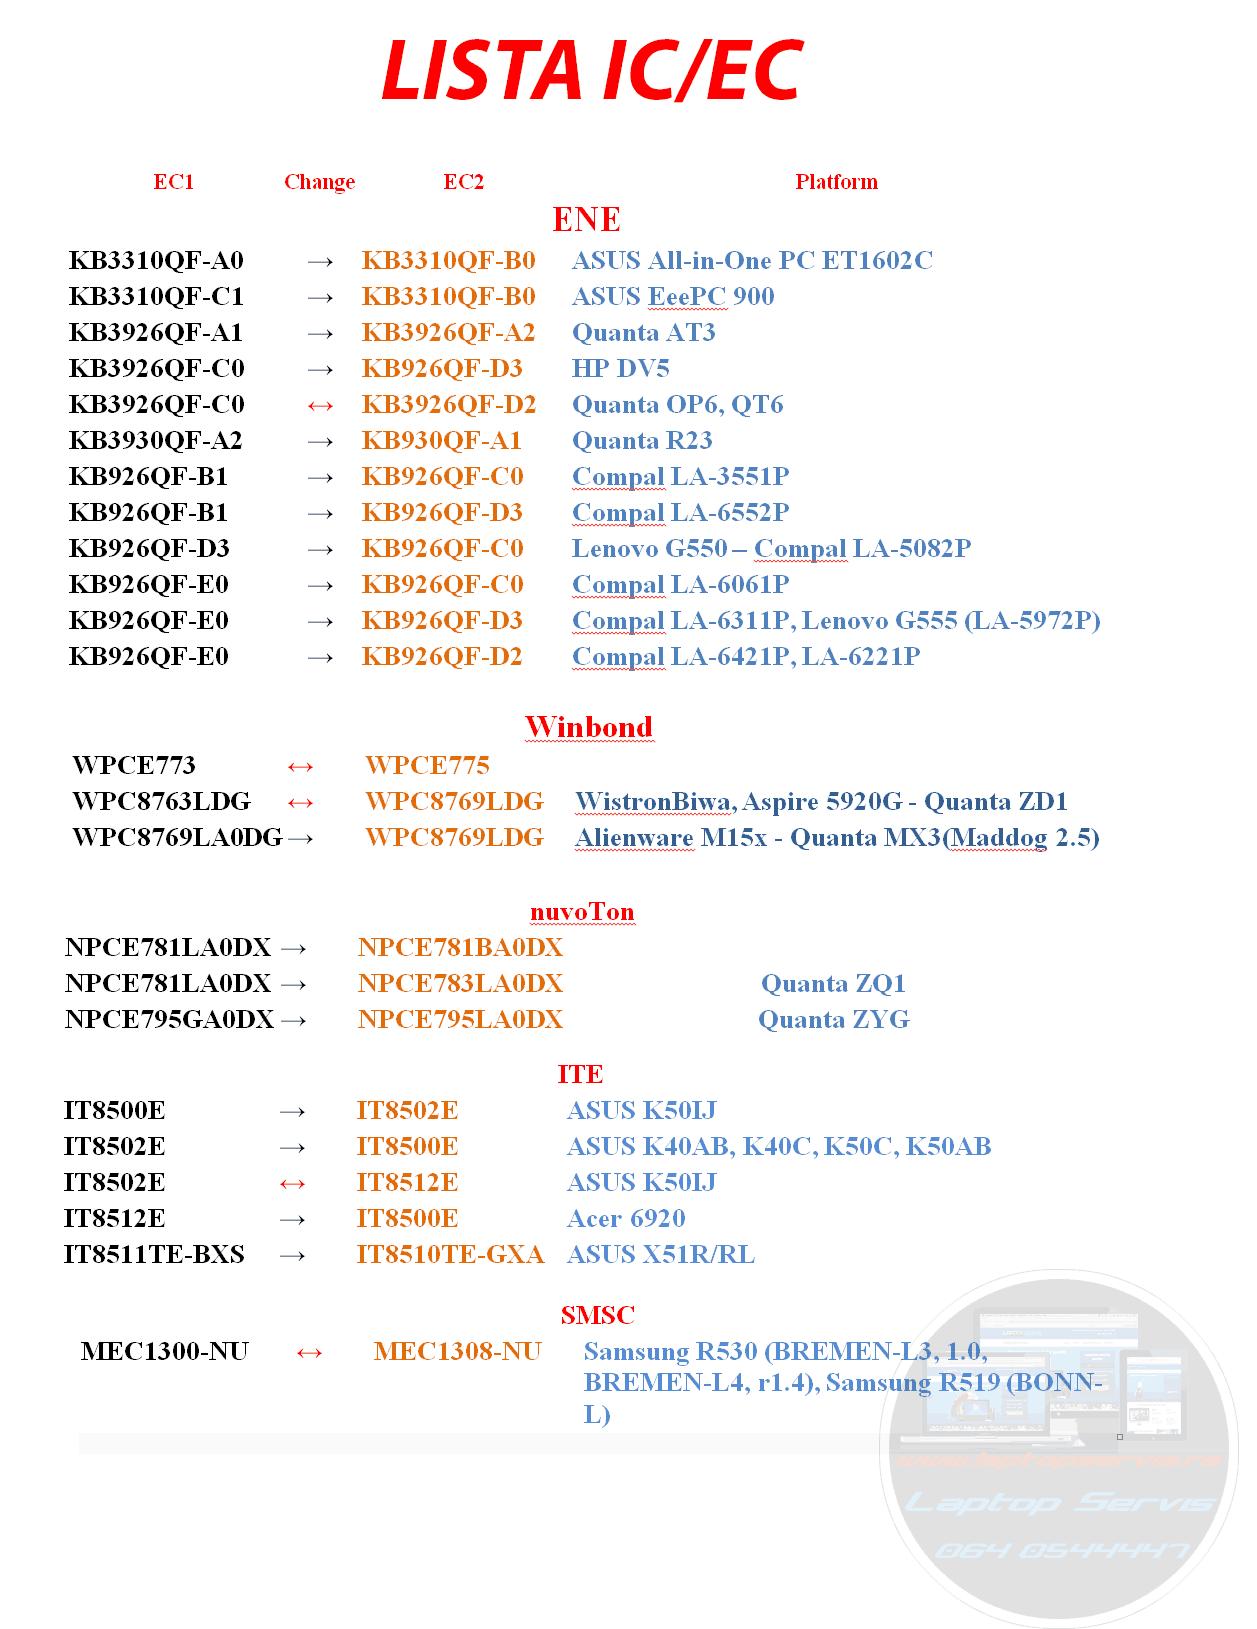 Lista IC-EC